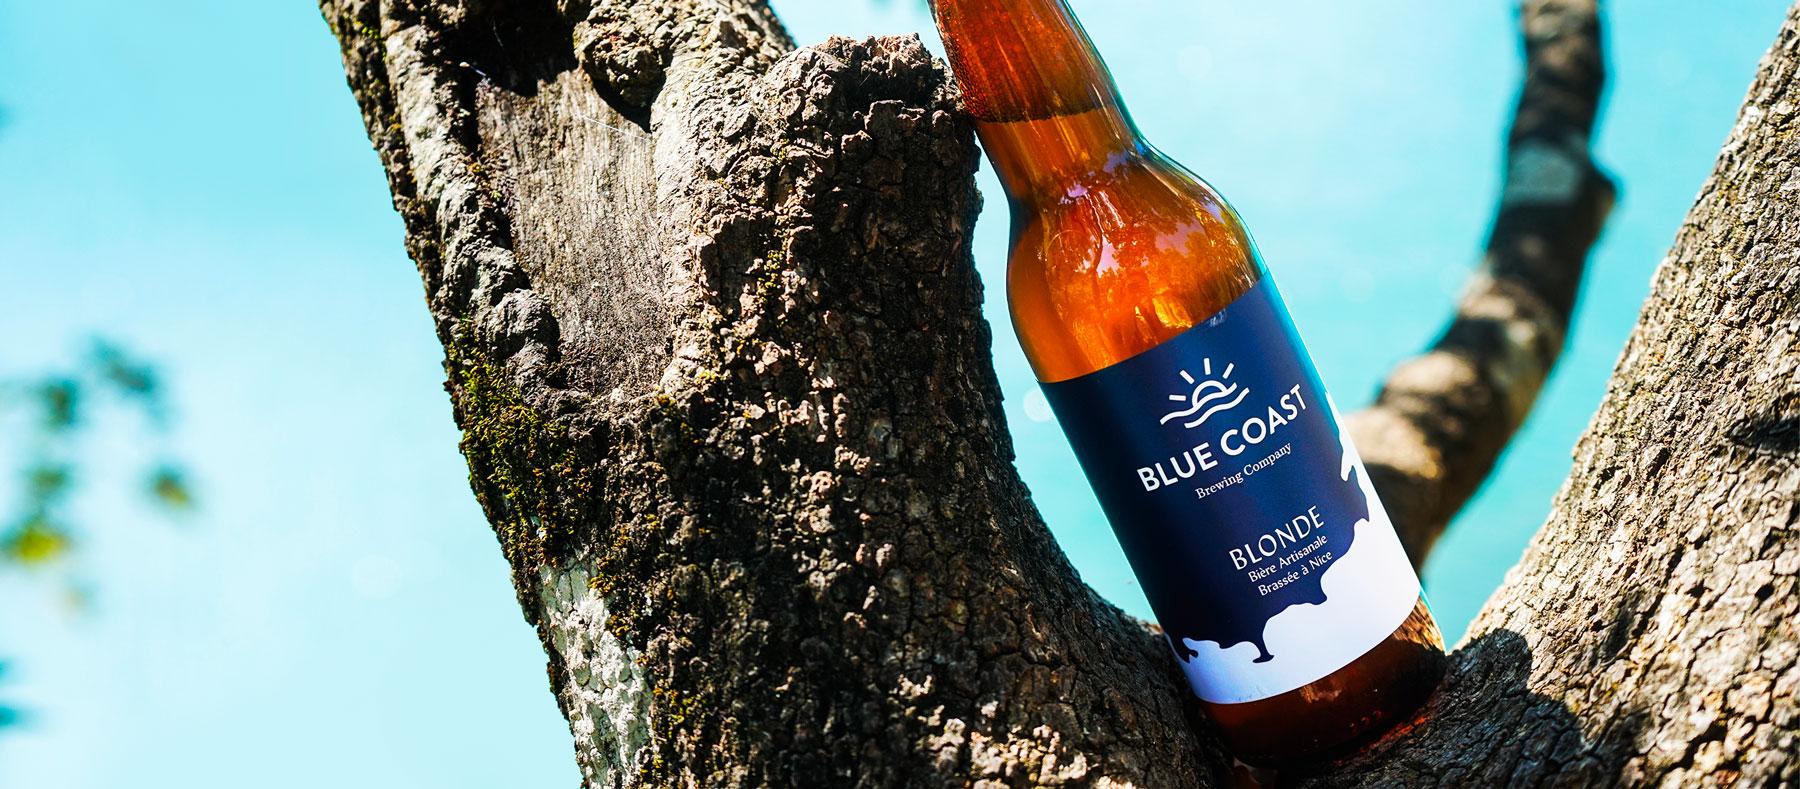 Case study Blue Coast par tequilarapido